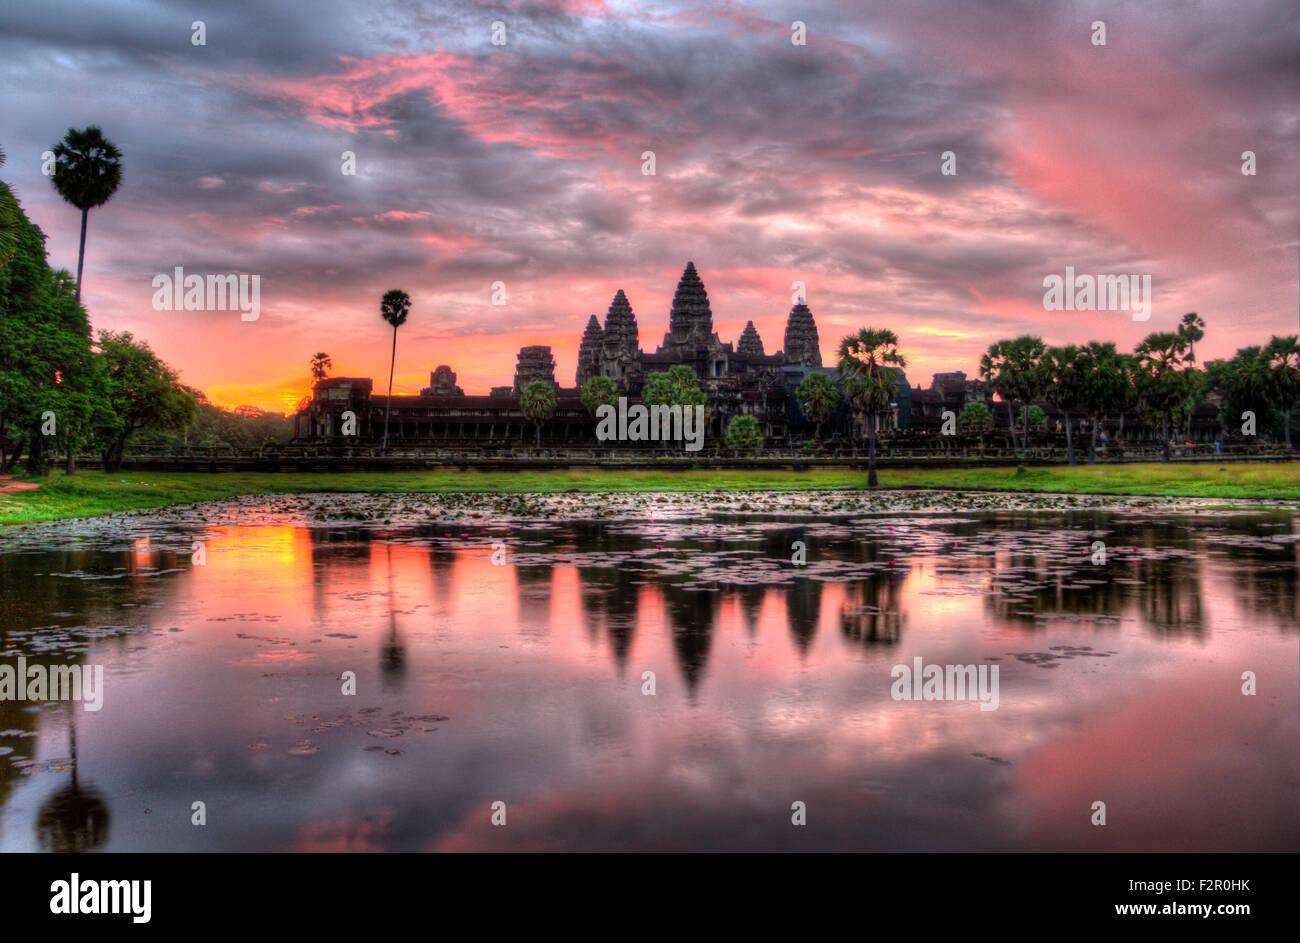 Lever du soleil sur Angkor Wat HDR Photo Stock